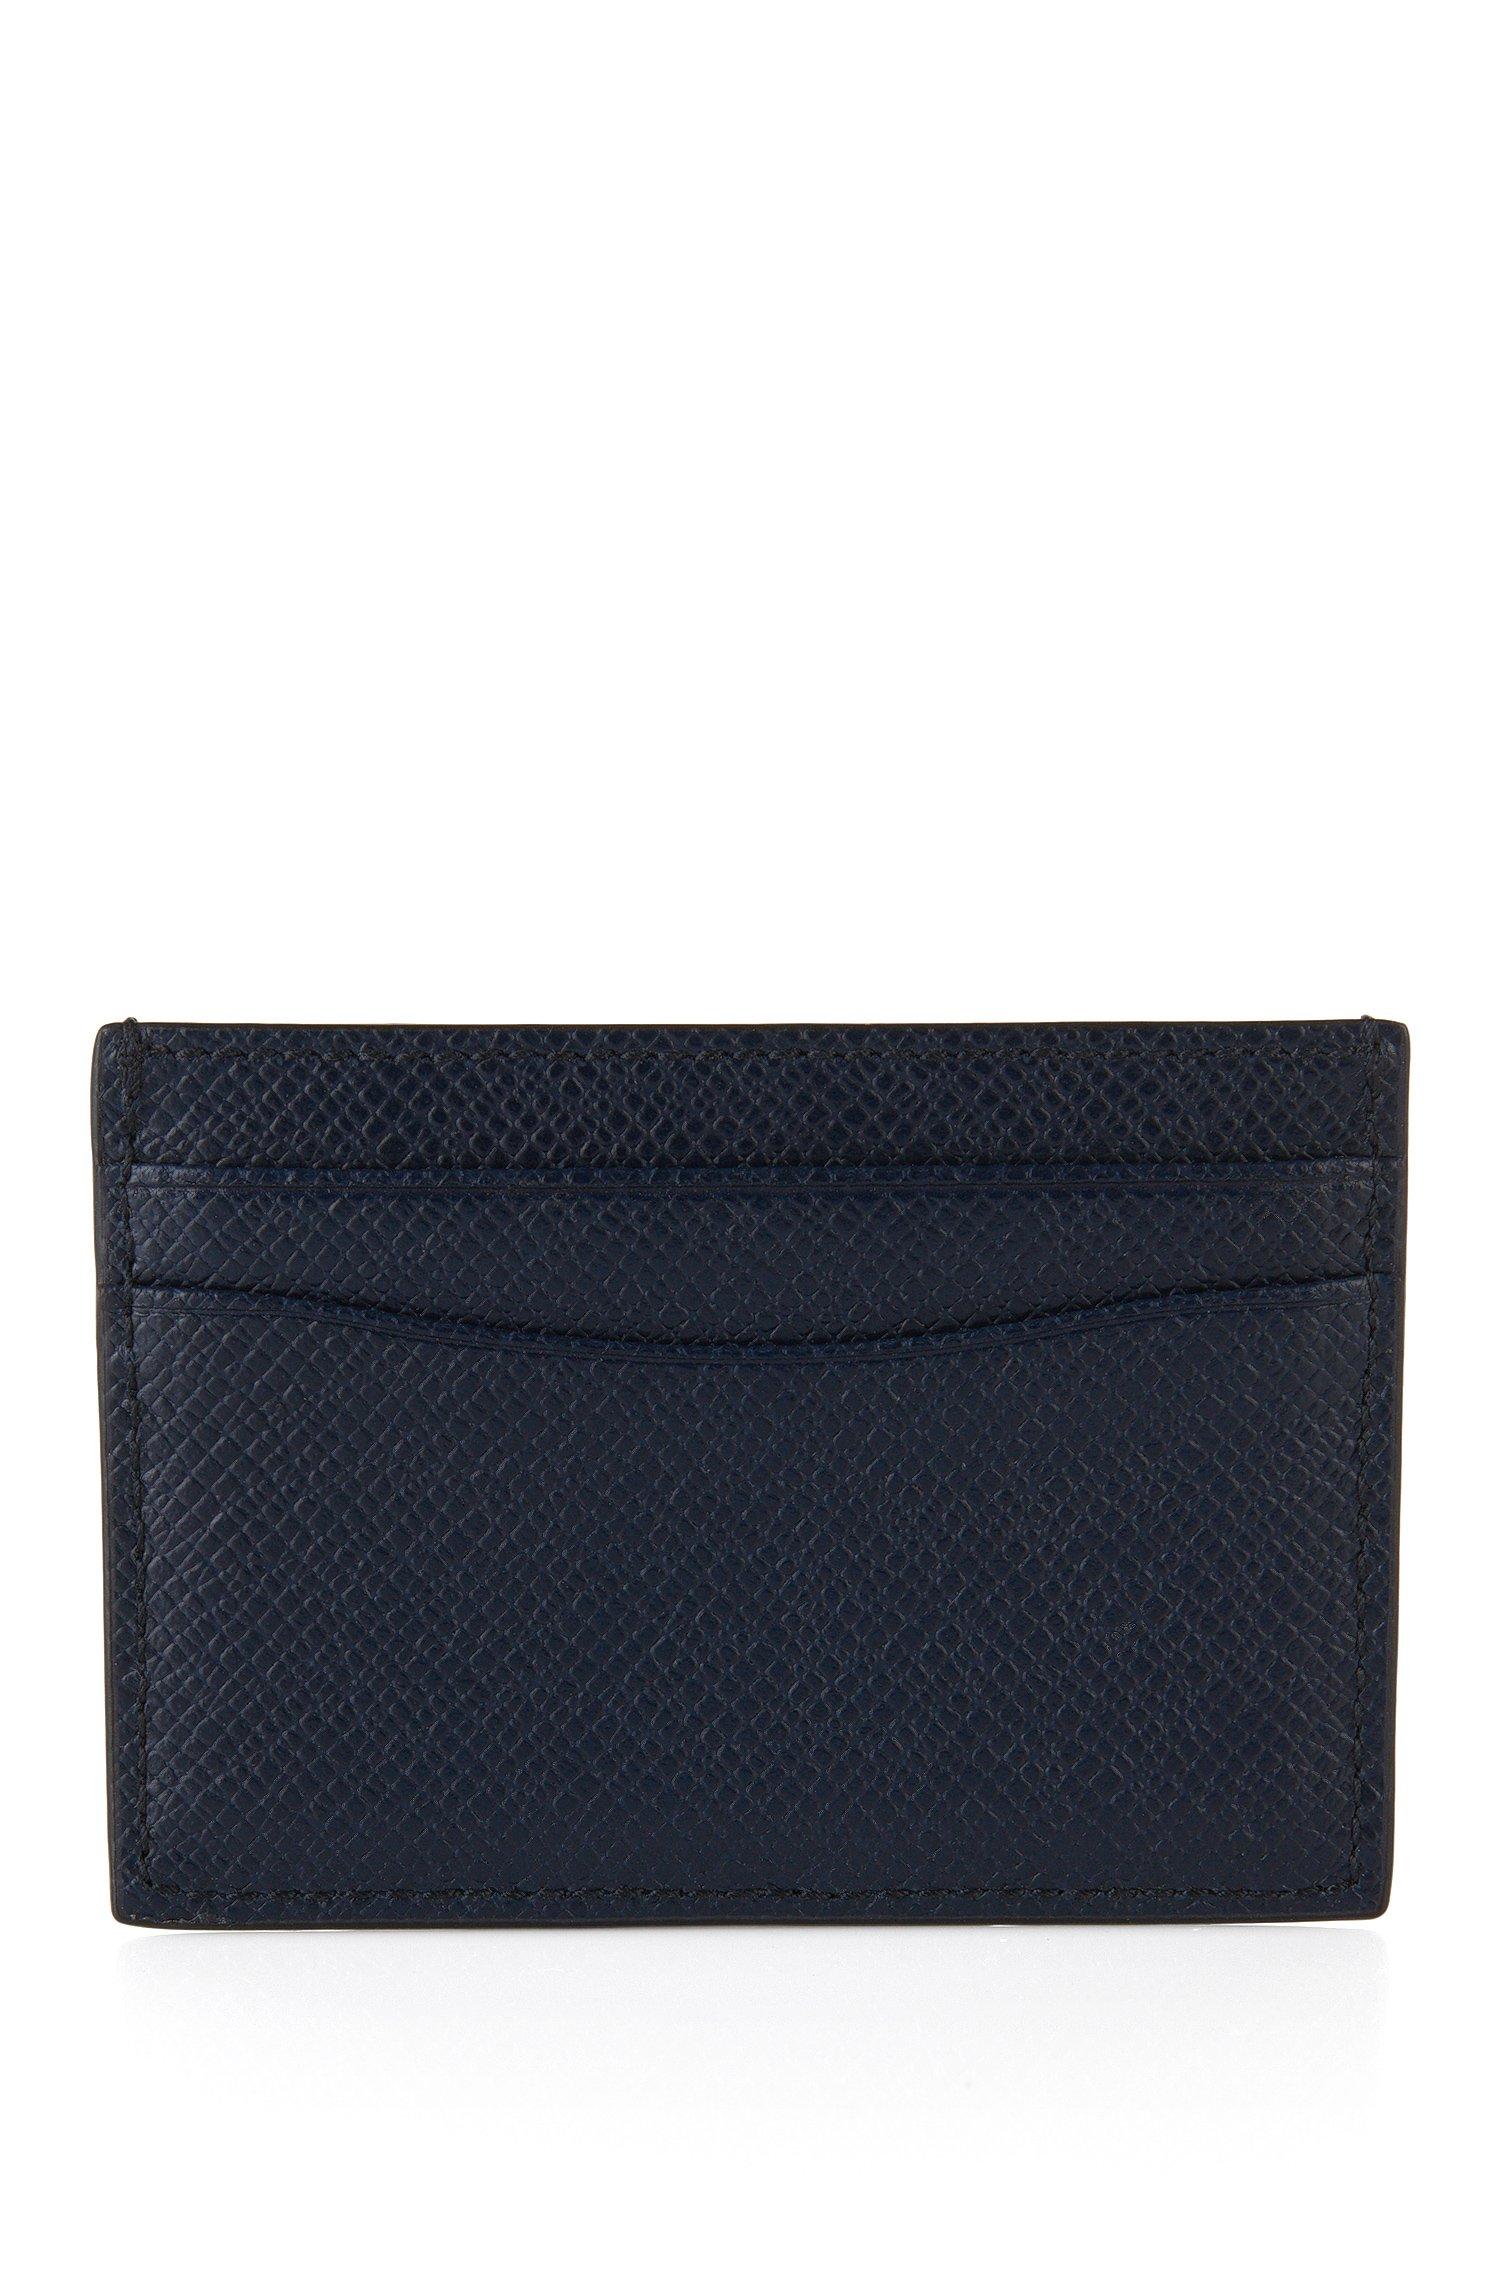 5217fa4103 Signature collection card leather. Hugo Boss HUGO BOSS | Wallets |  50311746401